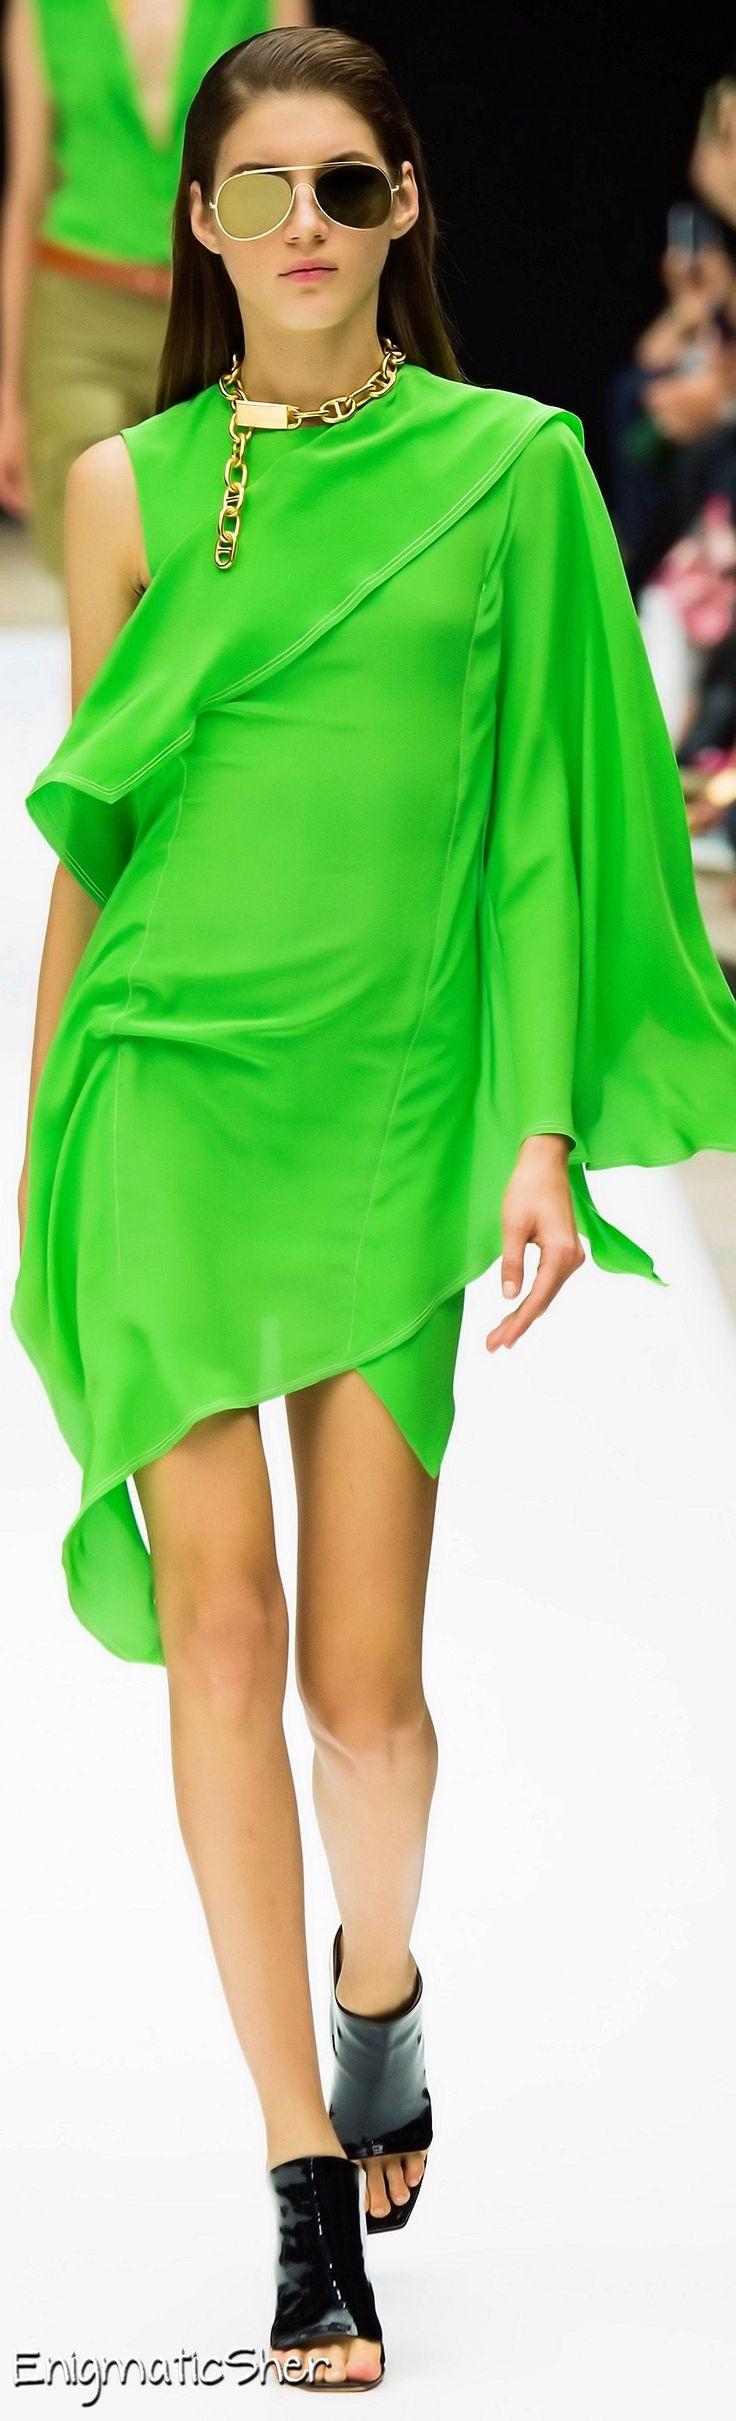 Acne Studios Spring Summer 2015 Ready-To-Wear